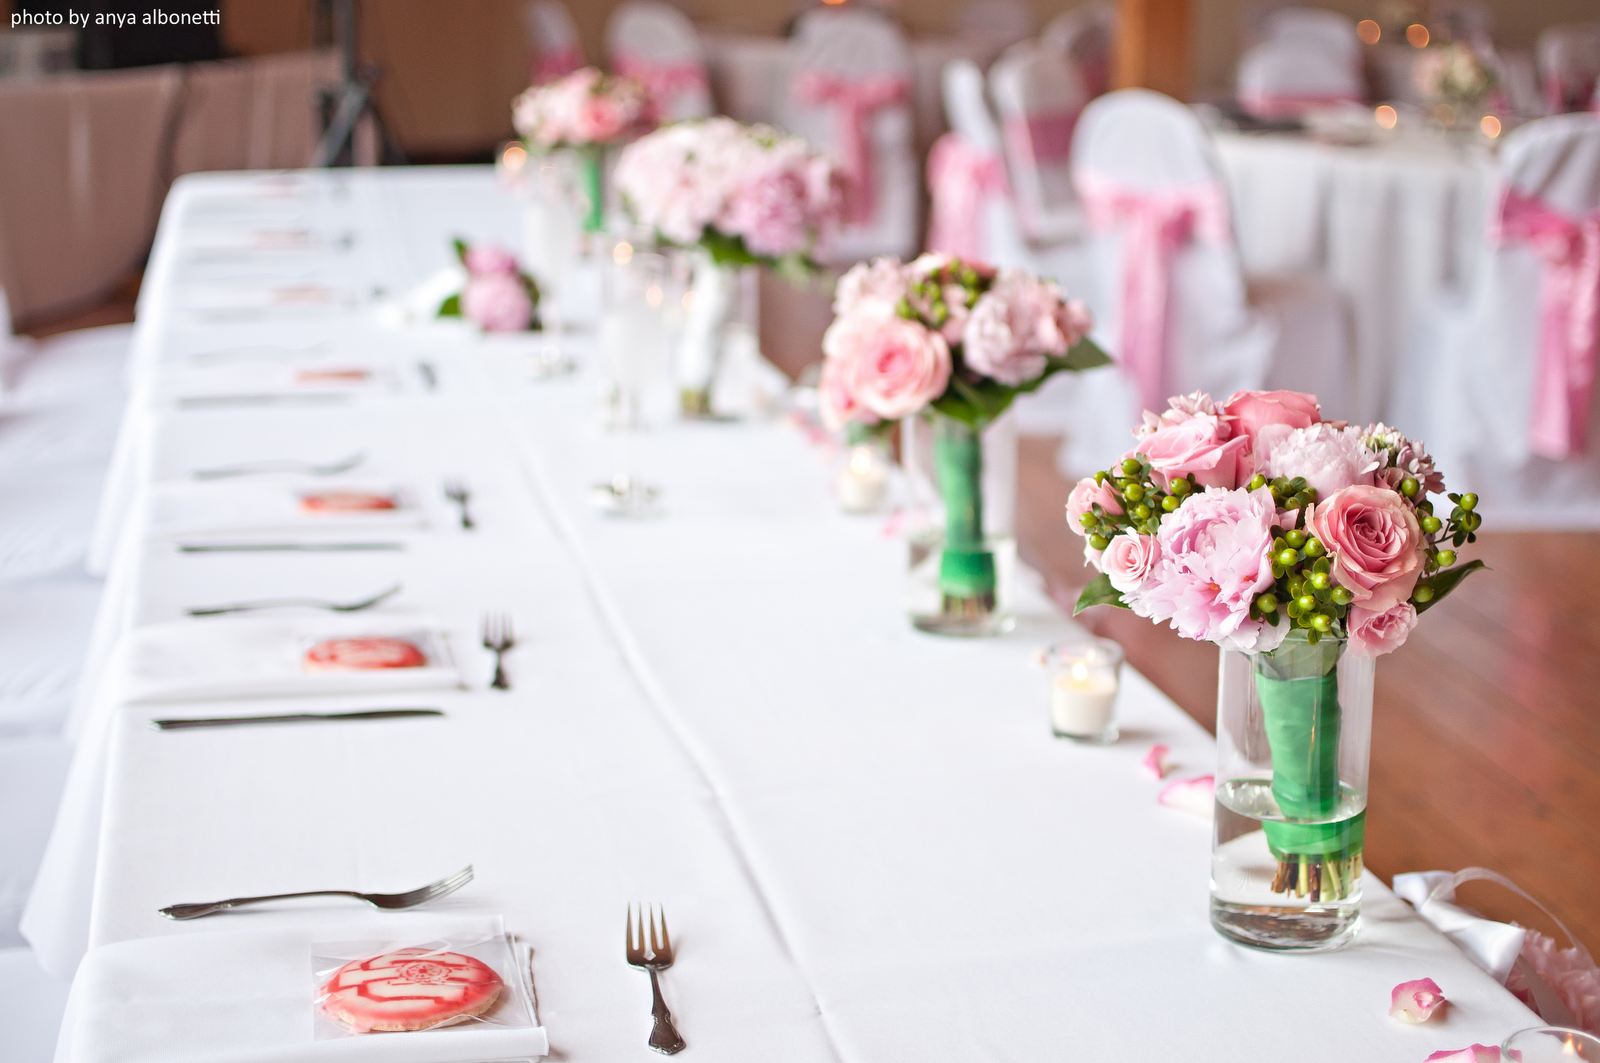 Our Wedding Reception